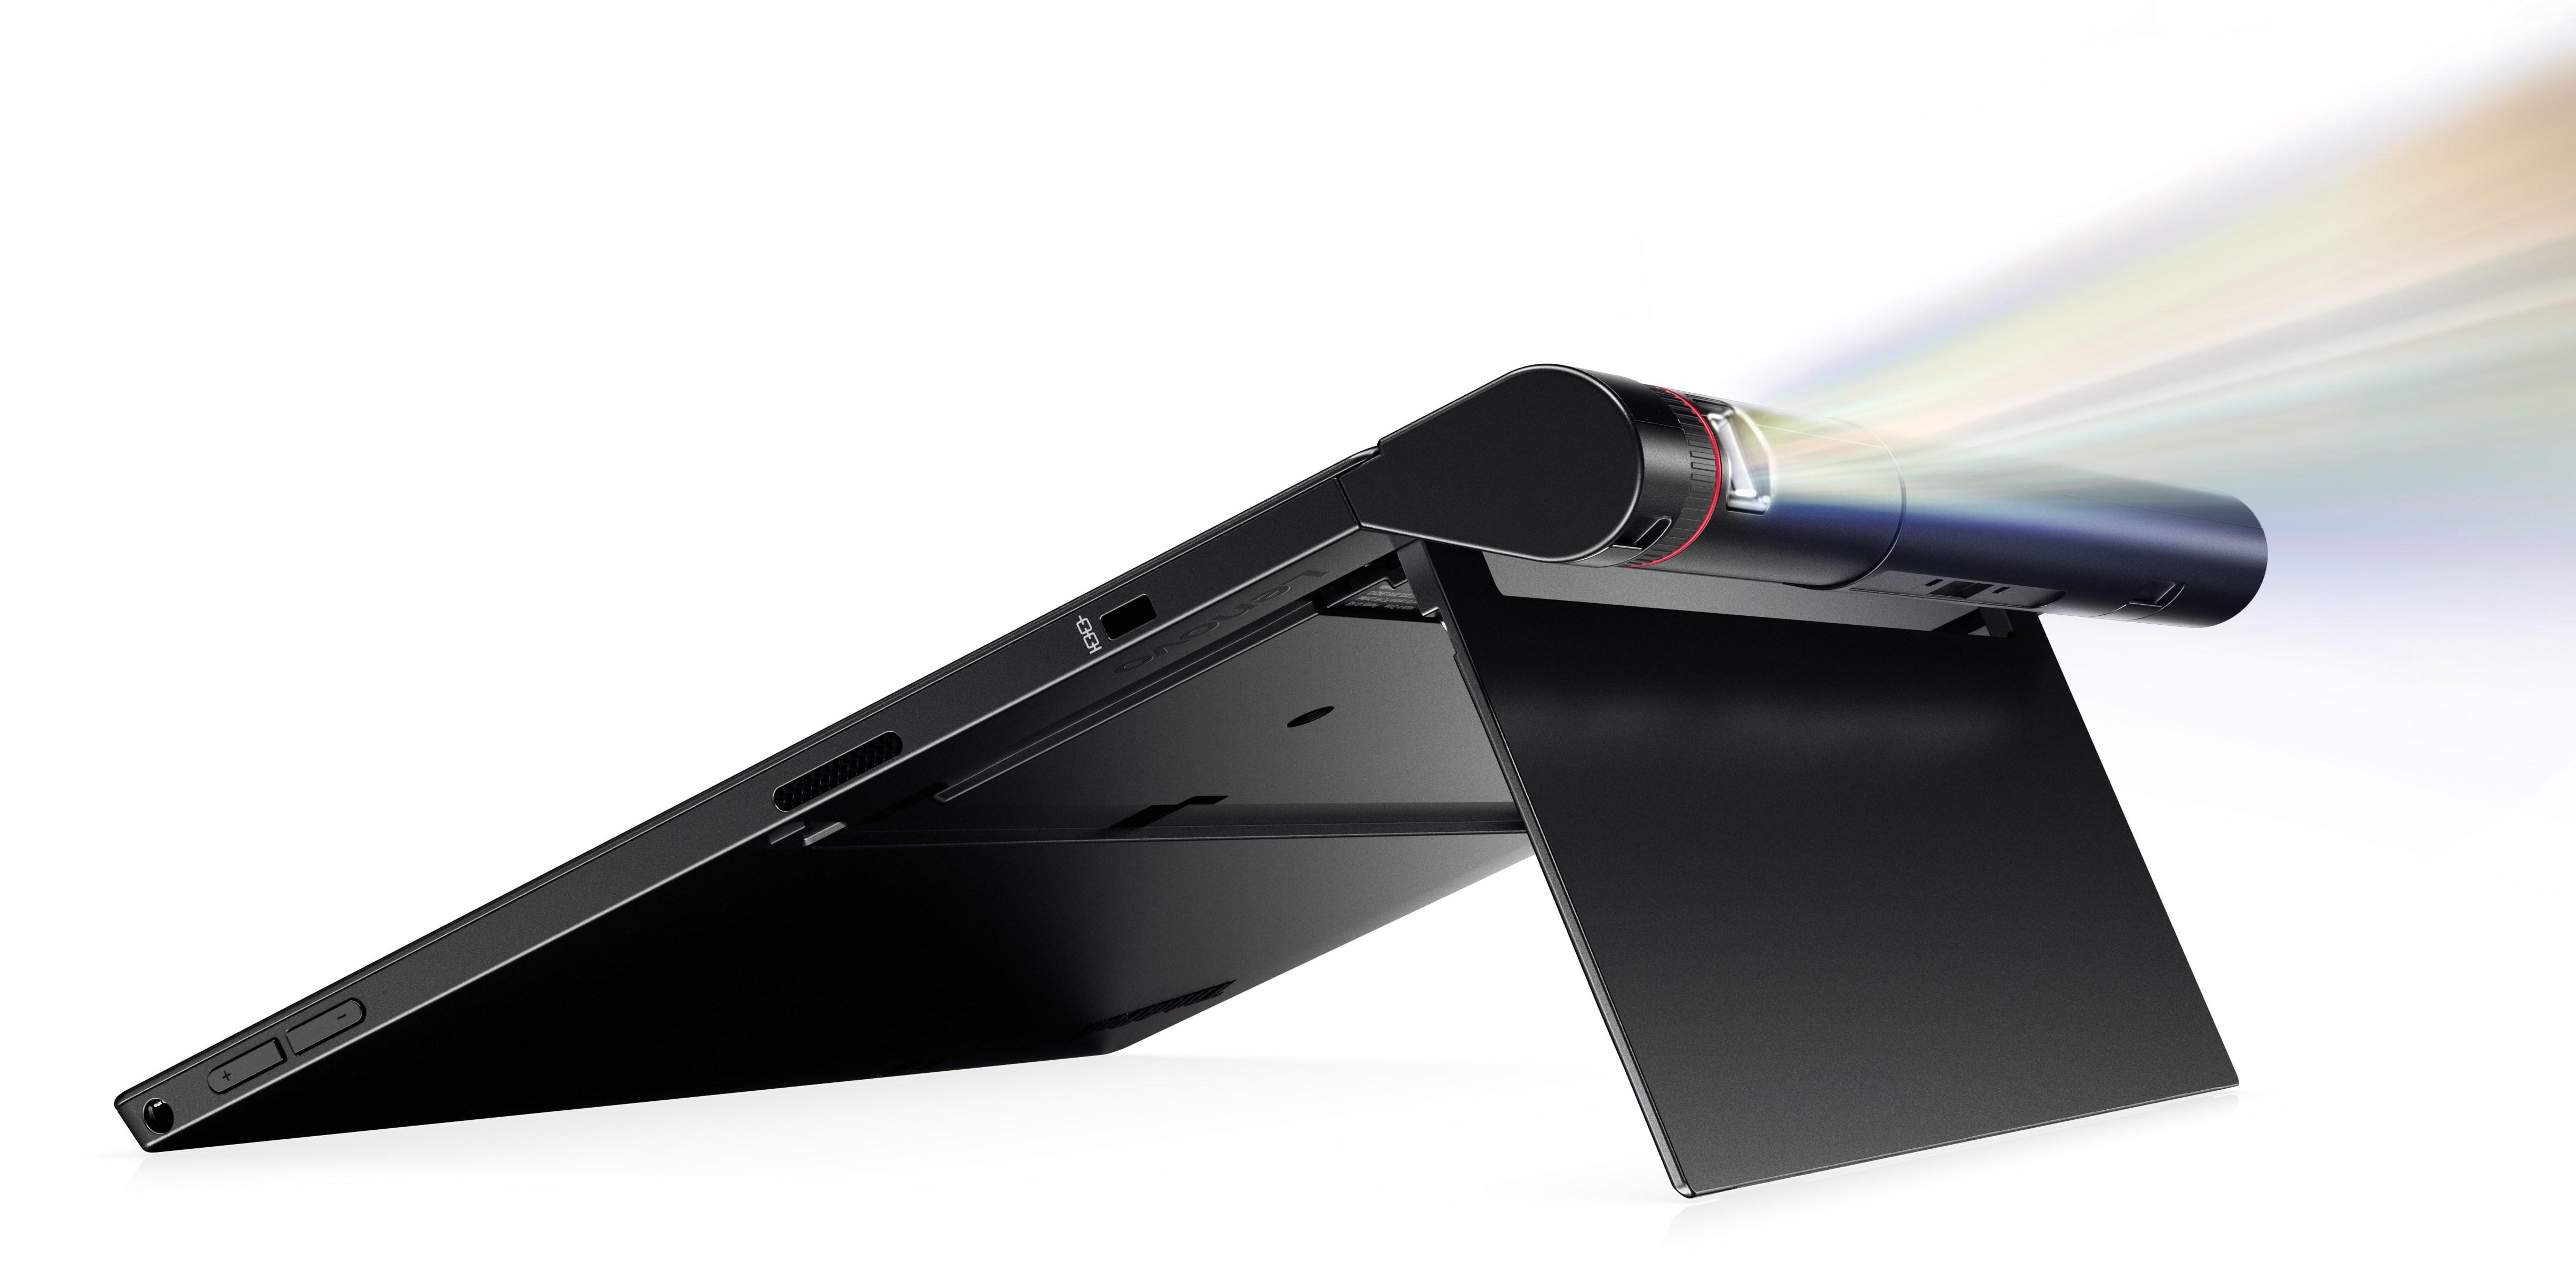 ThinkPad X1 Modular Tablet